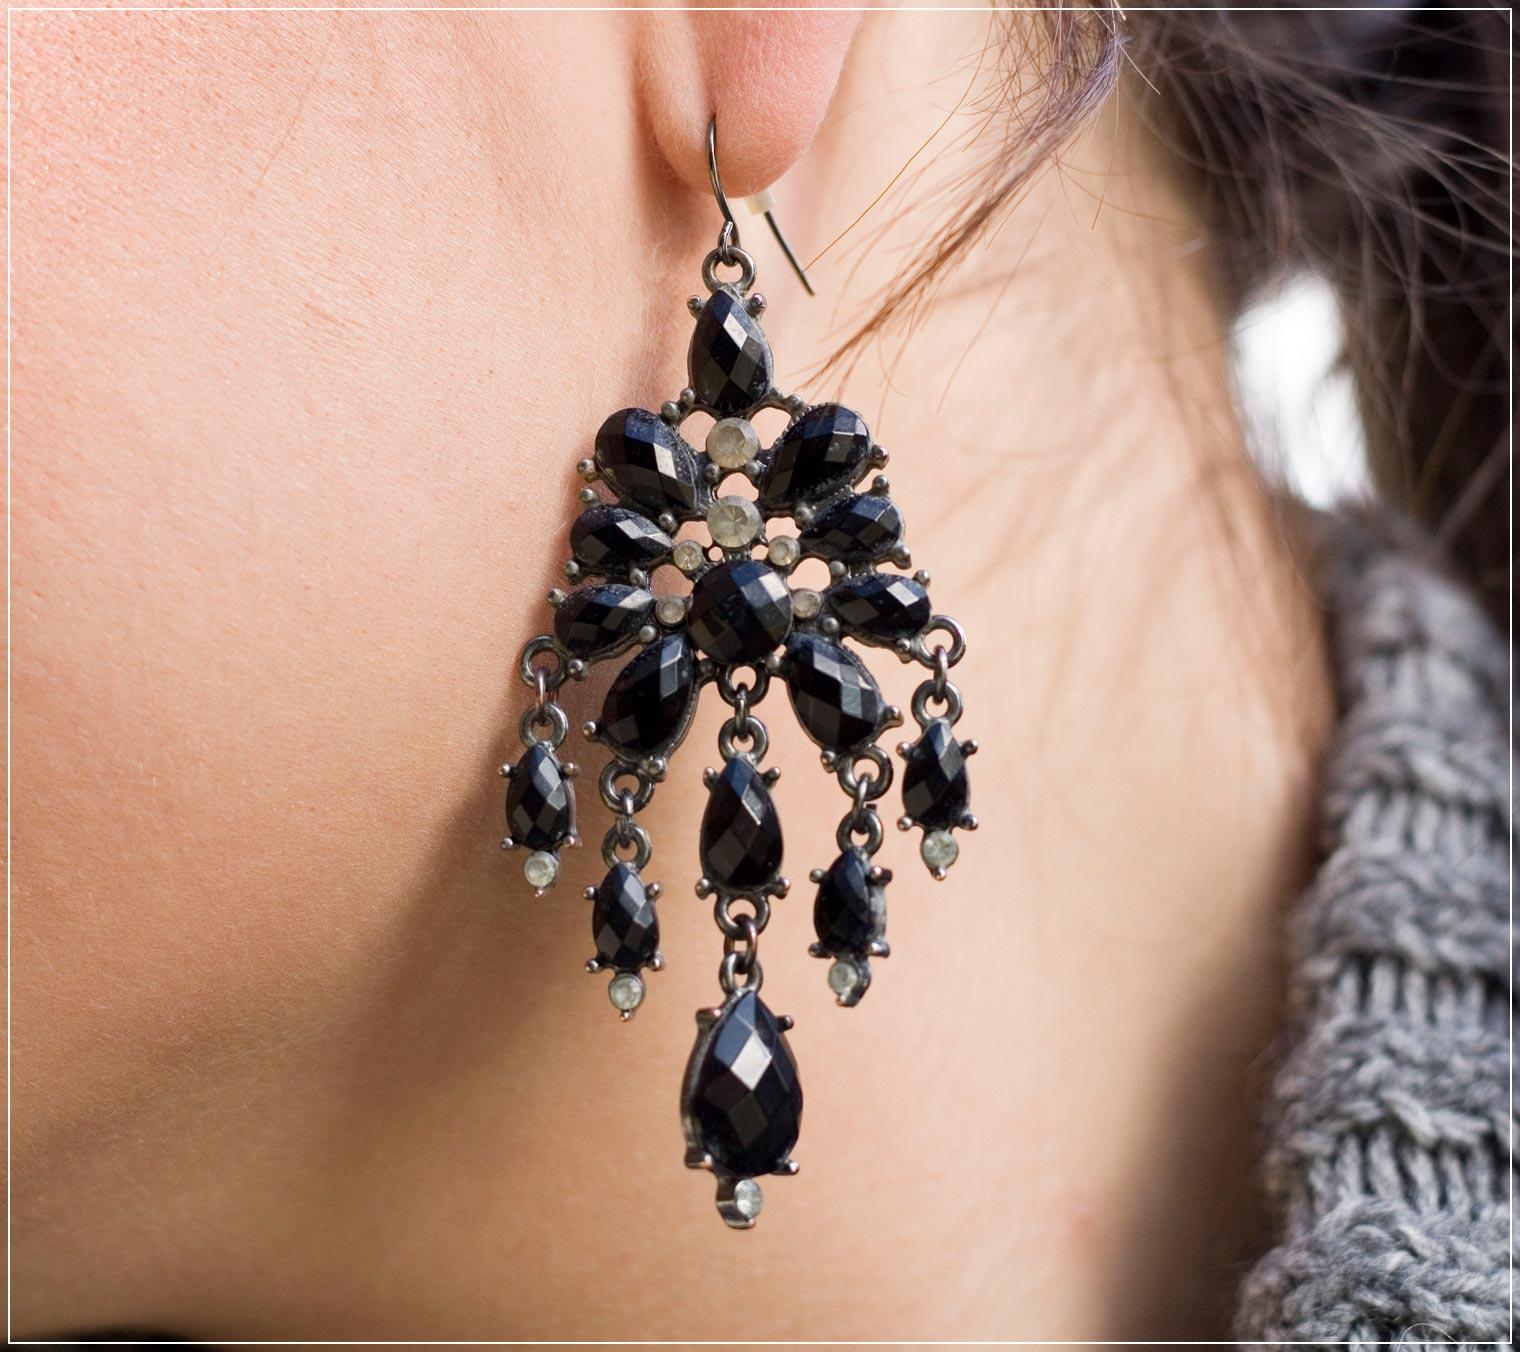 Ohrringe zum Herbstlook